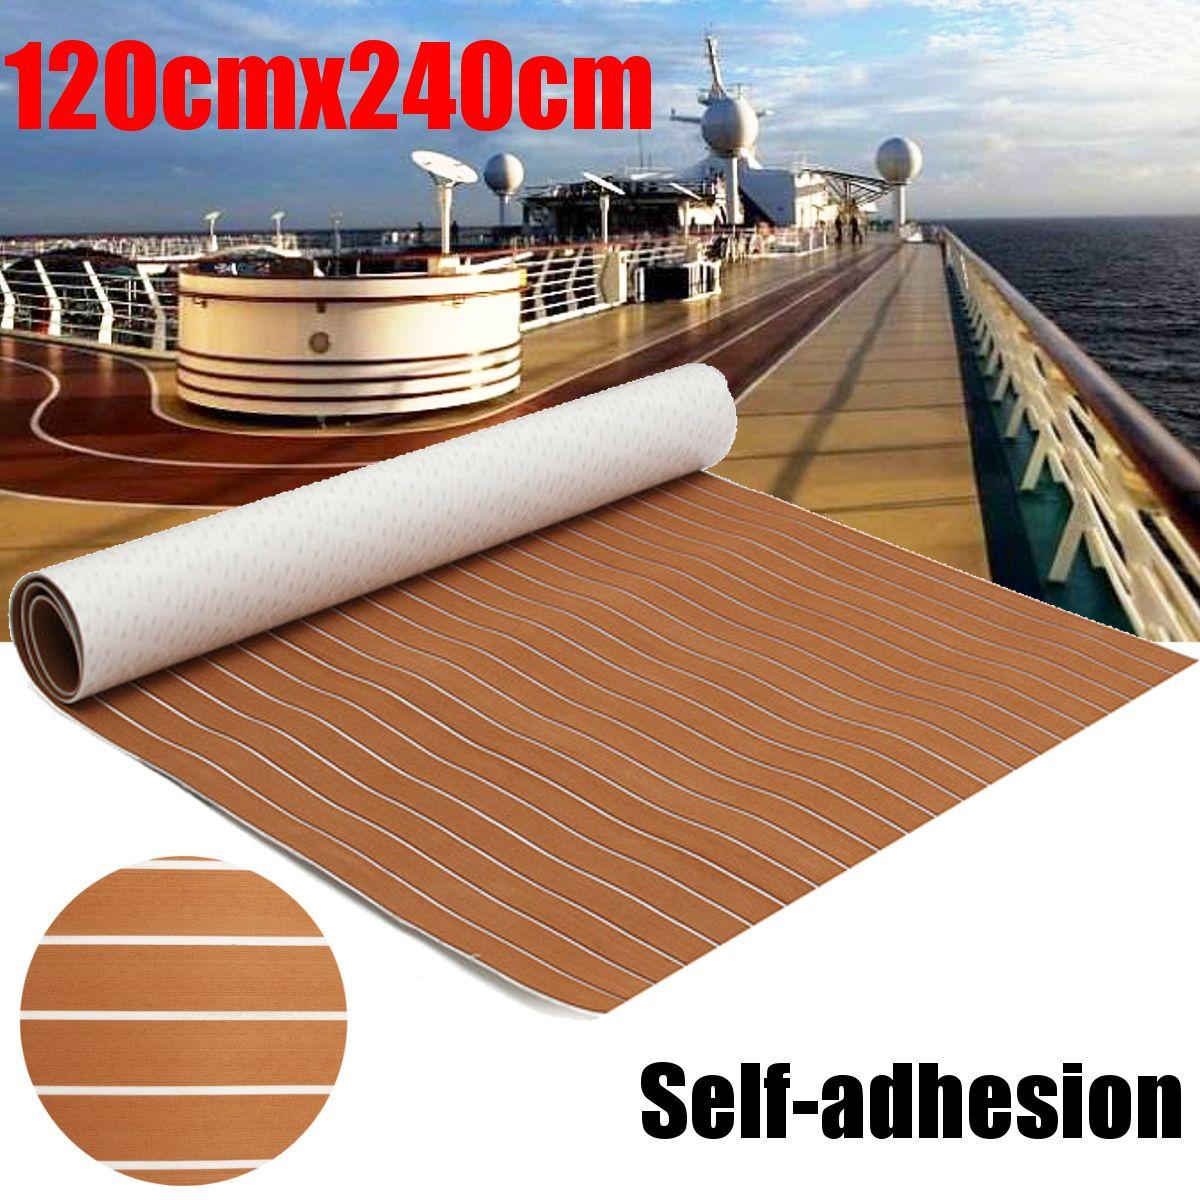 120x240cm Self Adhesive EVA Foam Teak Sheet Teak Flooring Teak Boat Decking Marine Car Yacht Floor Mat Synthetic Teak Pad